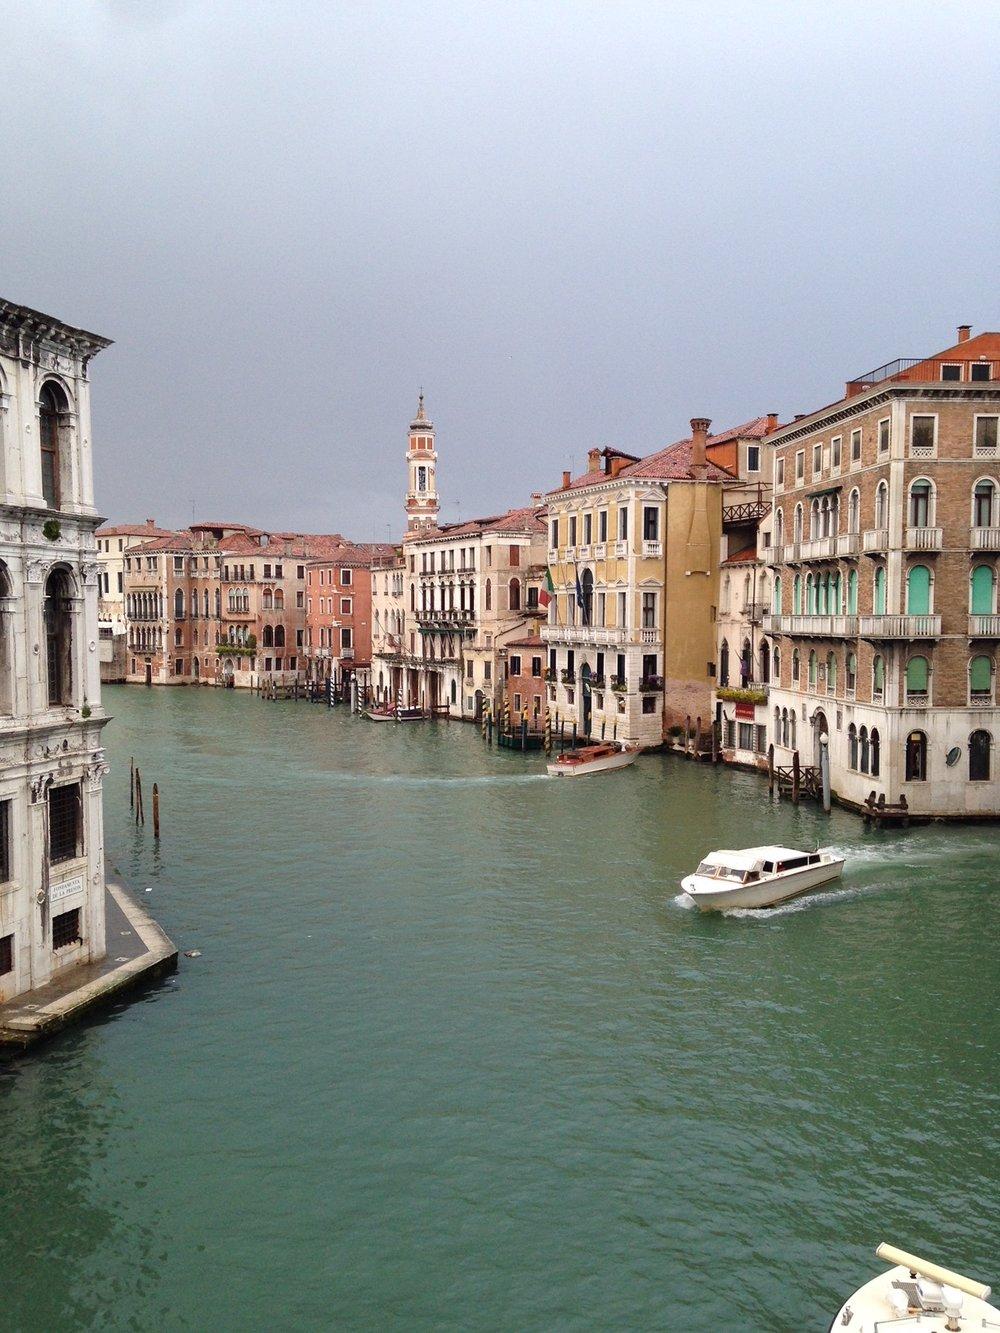 Venice_TheDestination_IrisFeb18.JPG